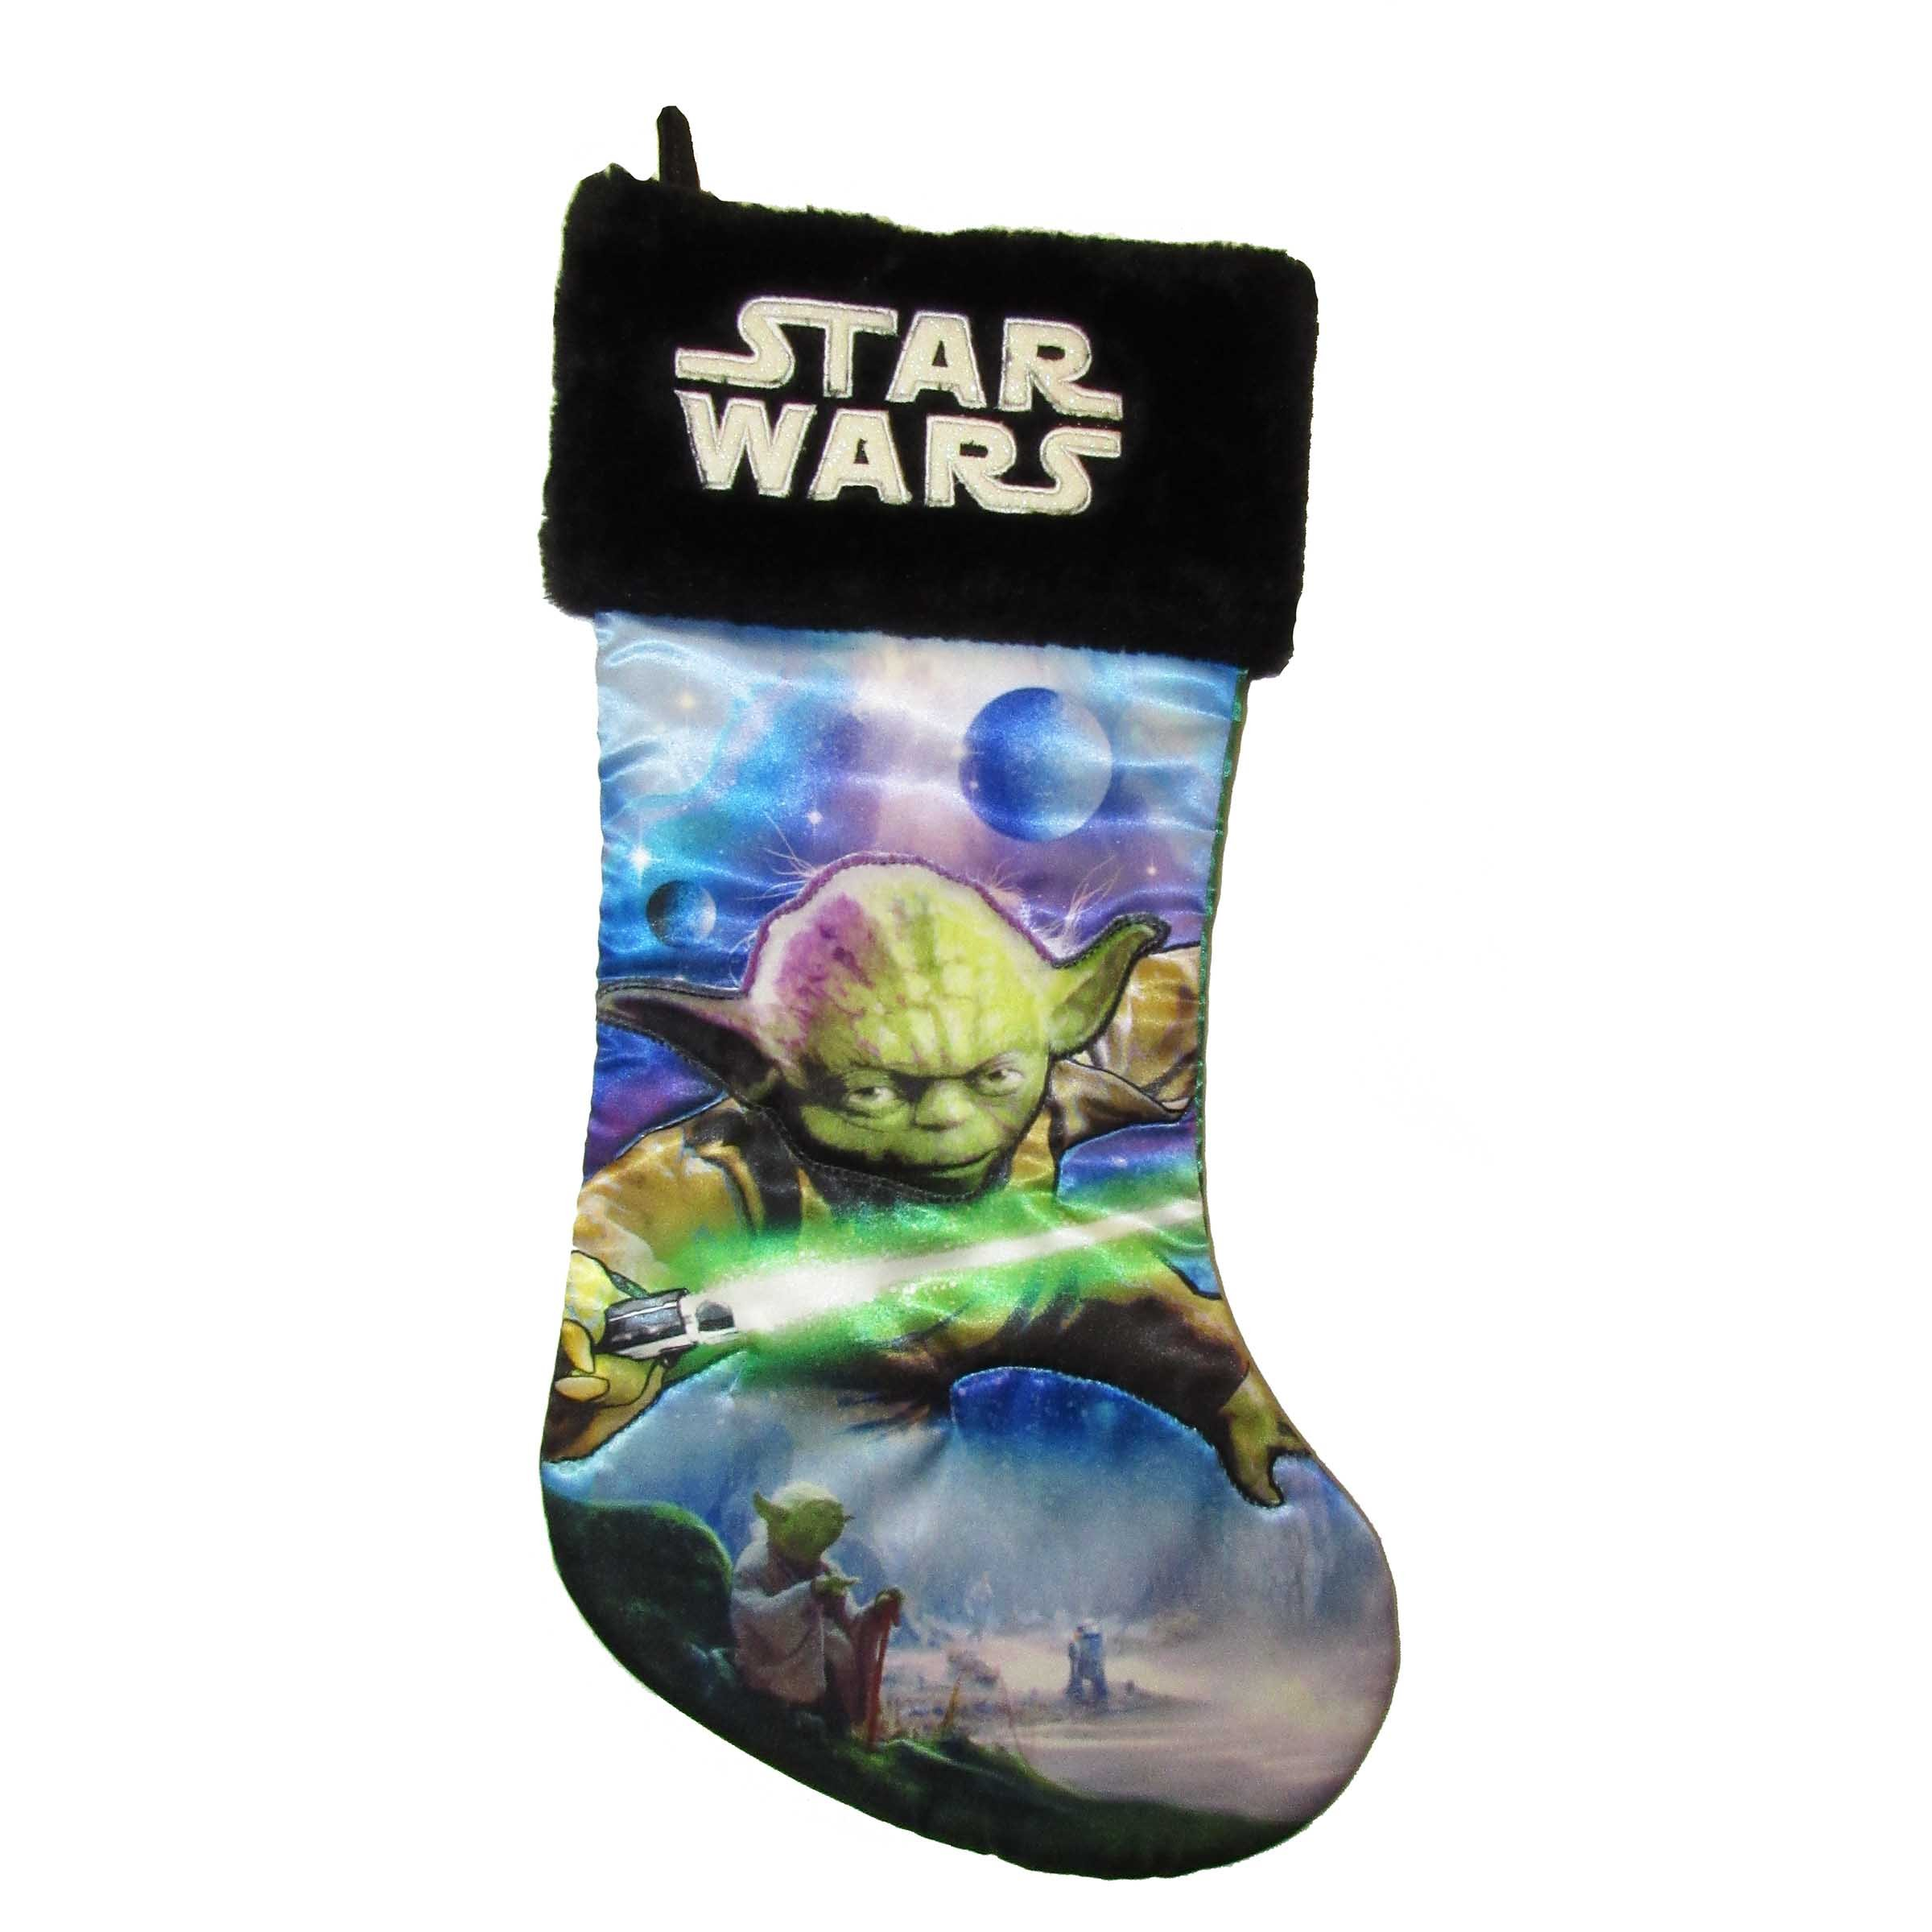 Star Wars Yoda 19'' Applique Stocking